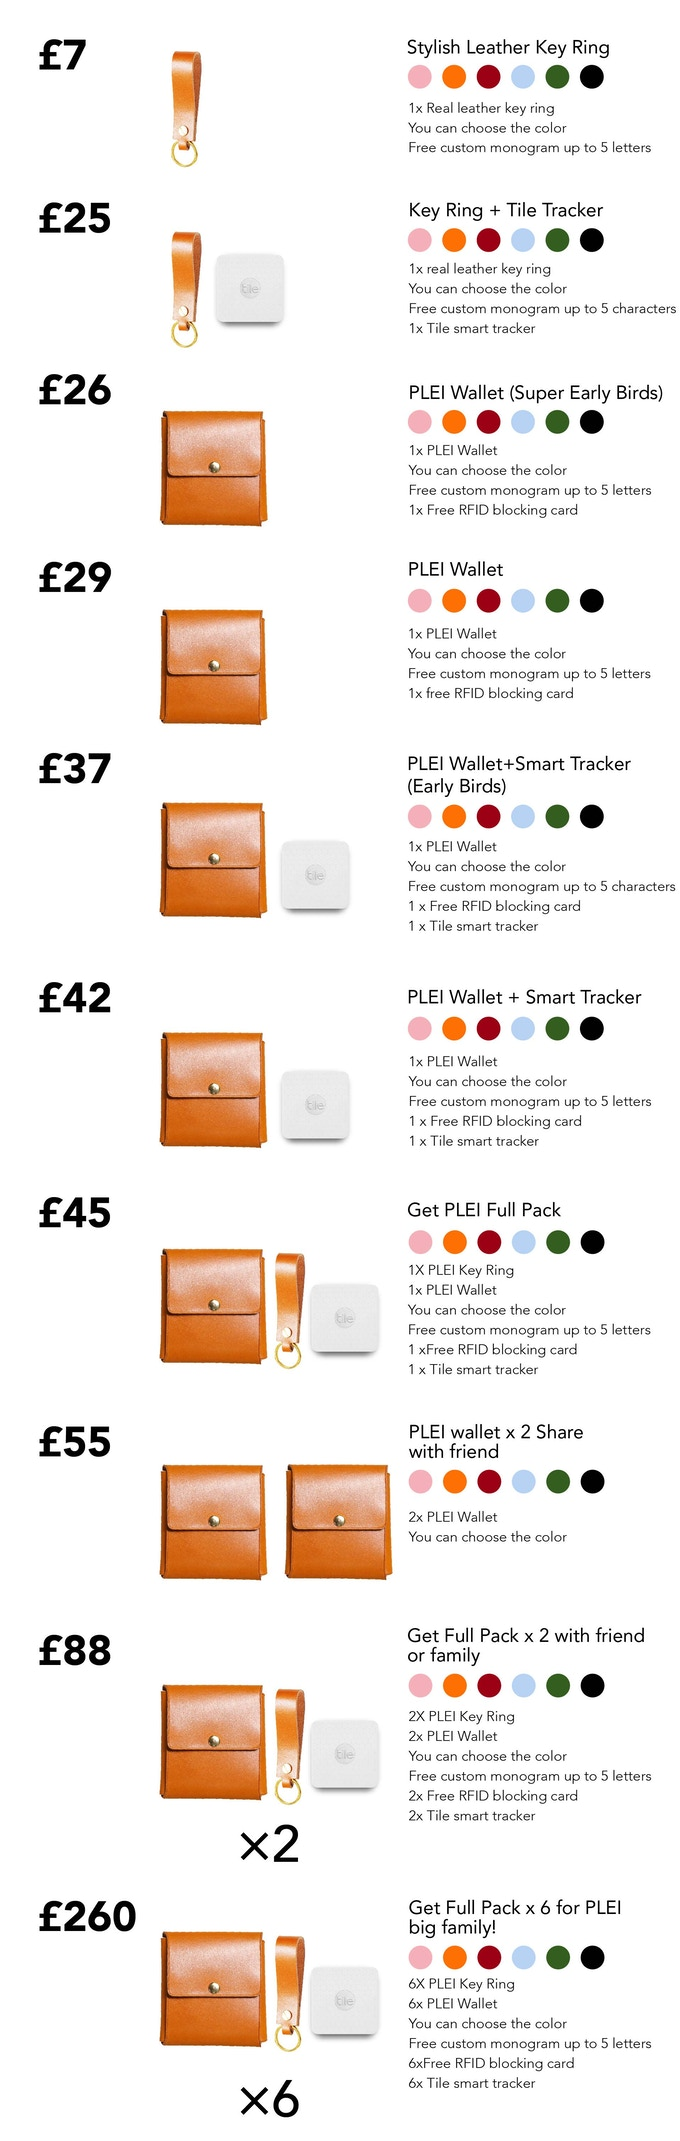 Sort Coins, Cash and Card in A Snap! PLEI Smart Quickstarter